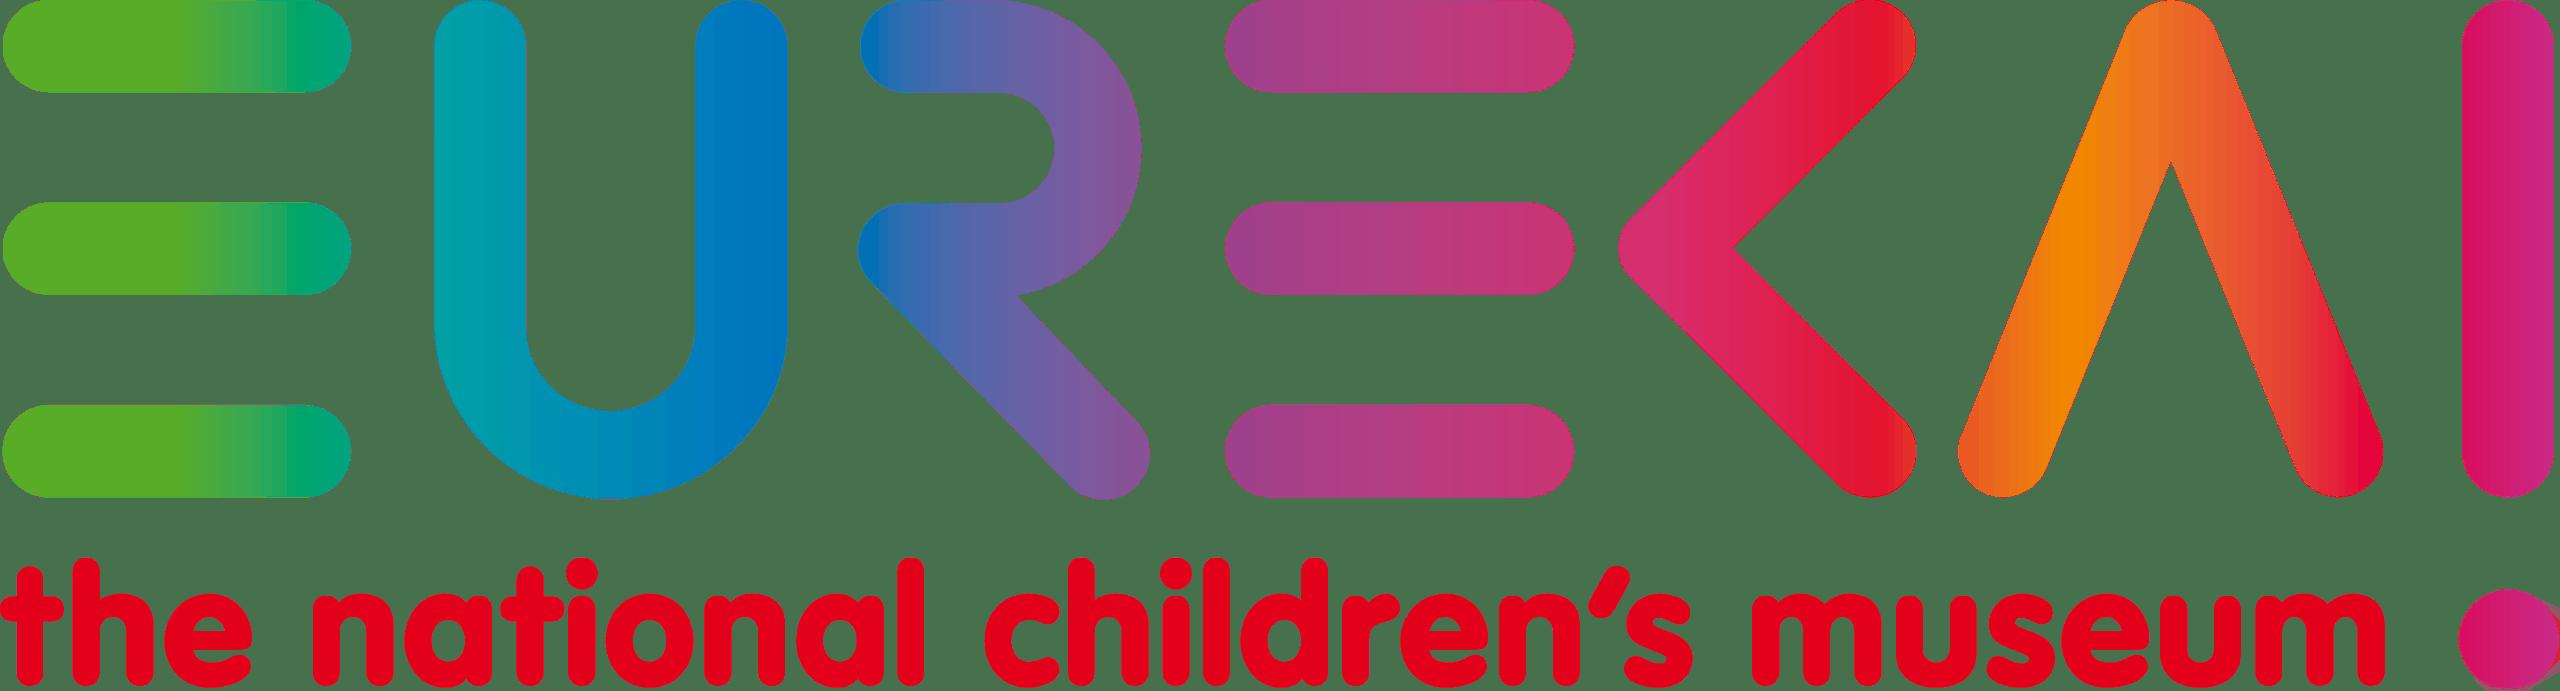 Eureka Childrens Museum logo